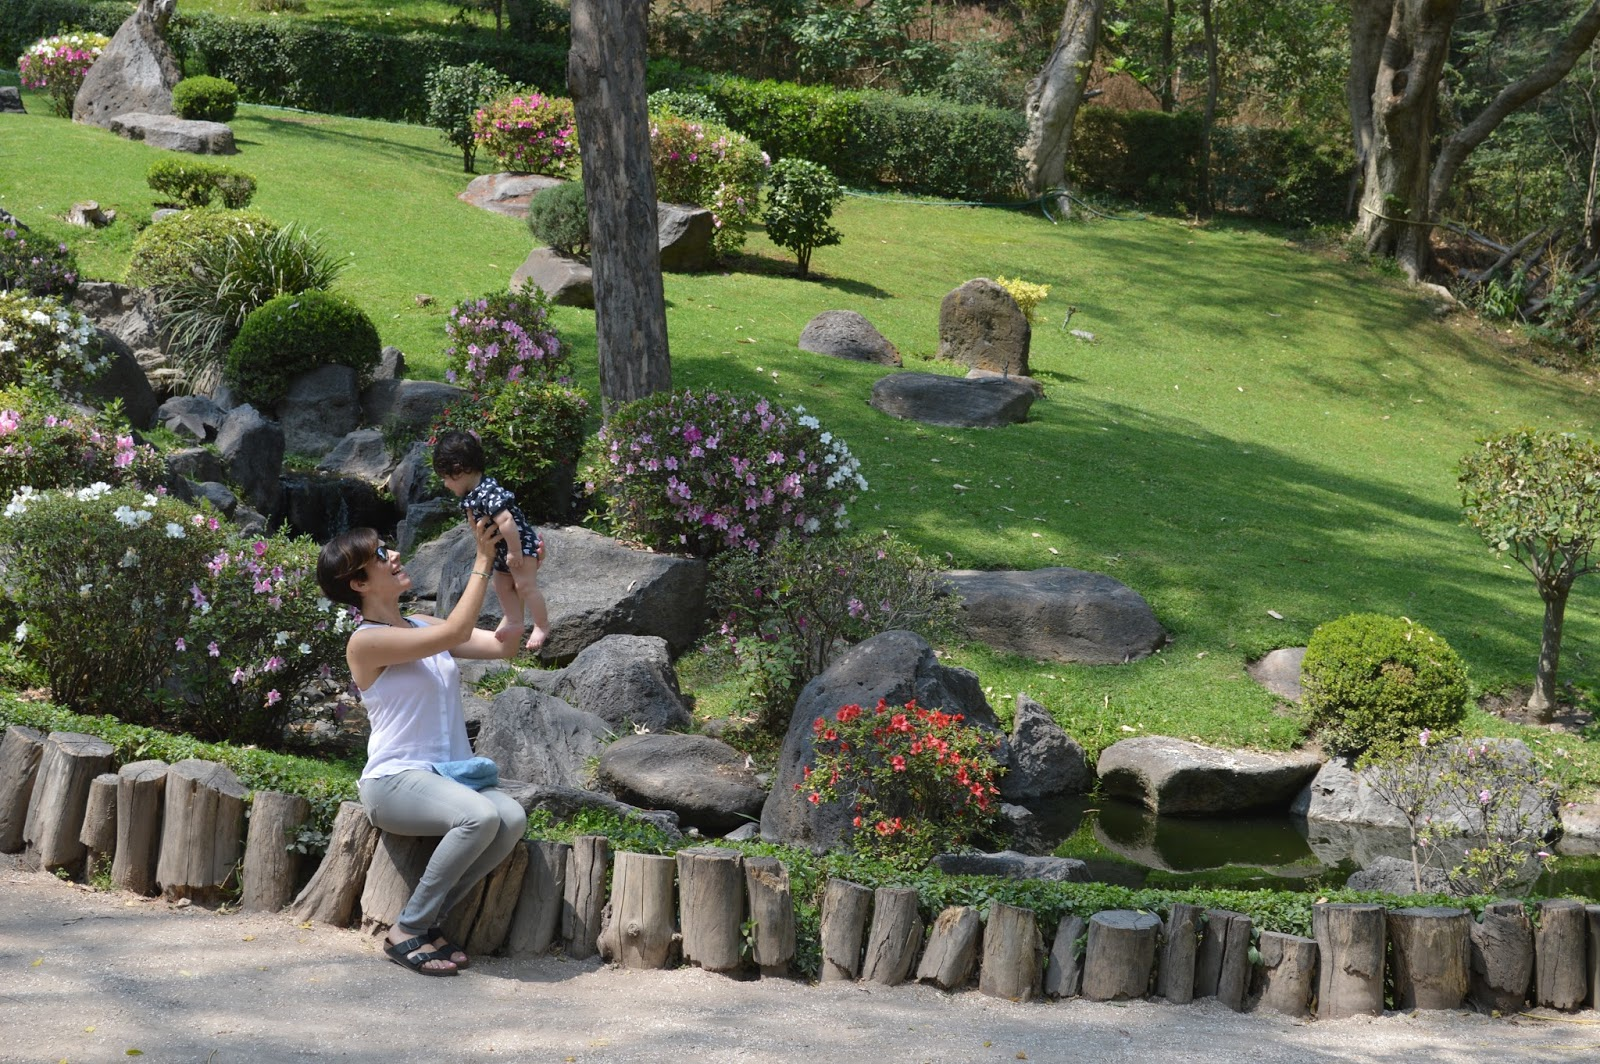 Jardin japones viva la montes for Jardin japones 2016